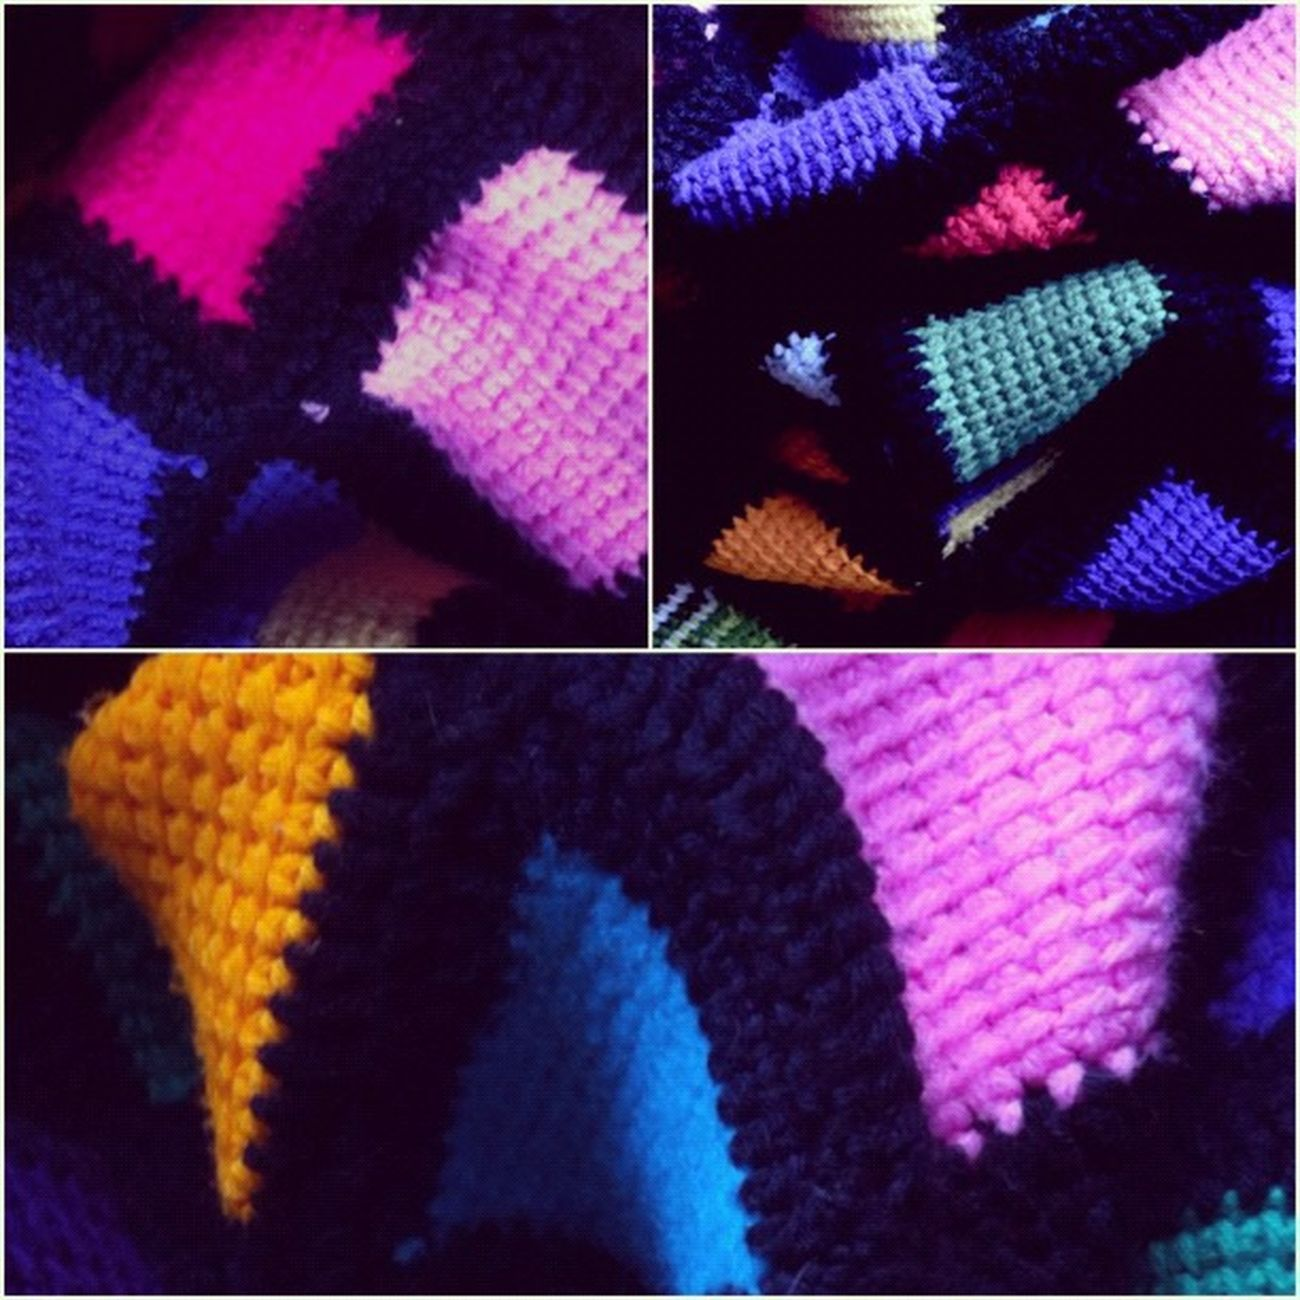 Crocheted granny-square #aphgan #squares #crochet #handmade #iphoneonly Handmade Iphoneonly Crochet Squares Aphgan